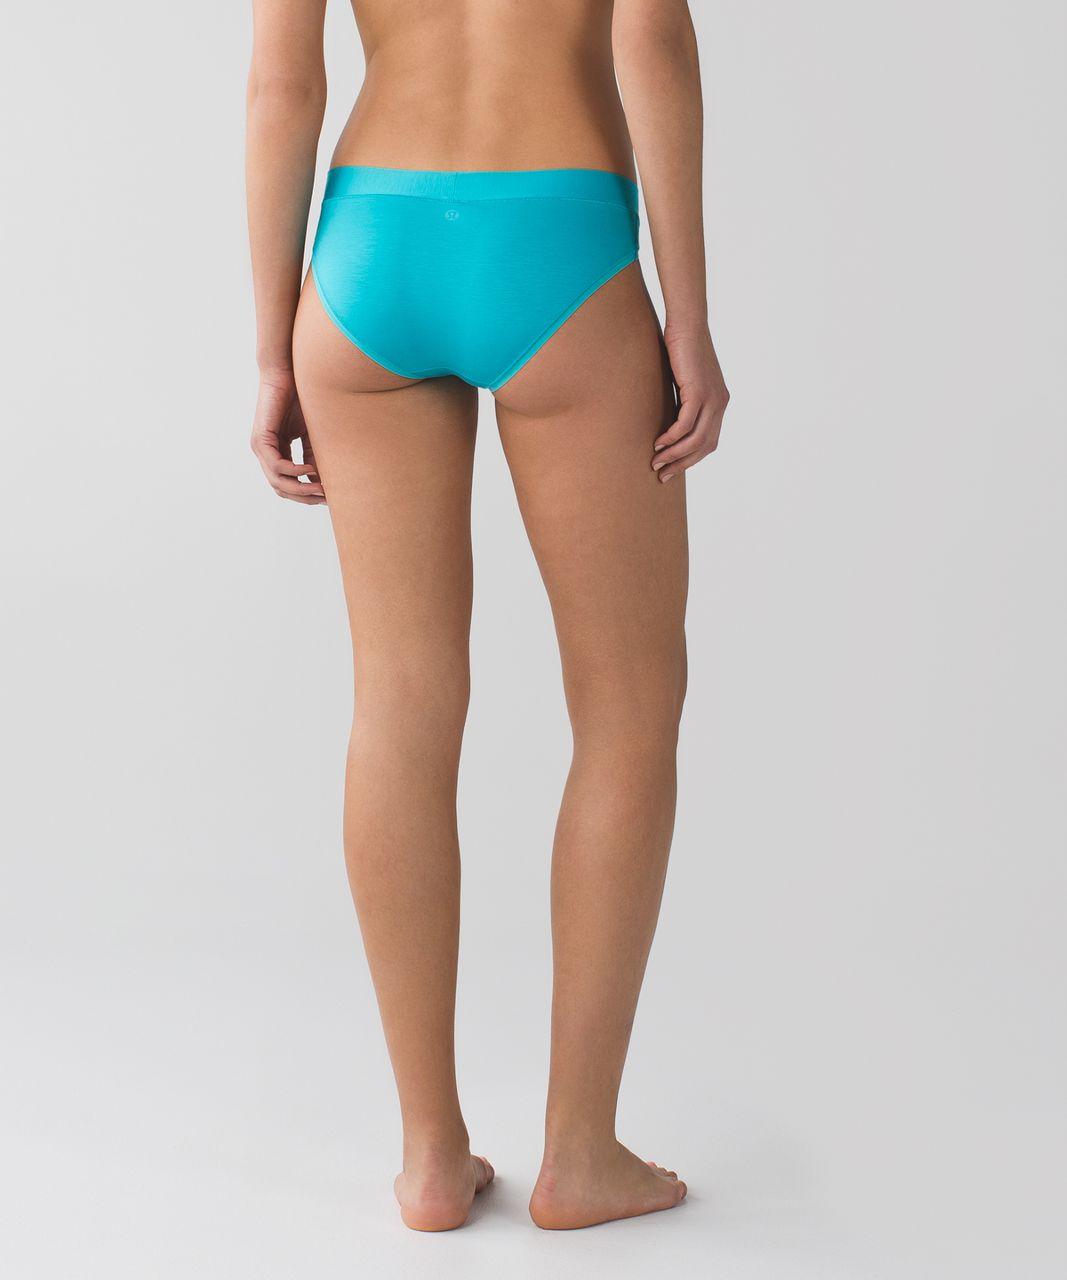 Lululemon Mula Bandhawear Bikini - Peacock Blue